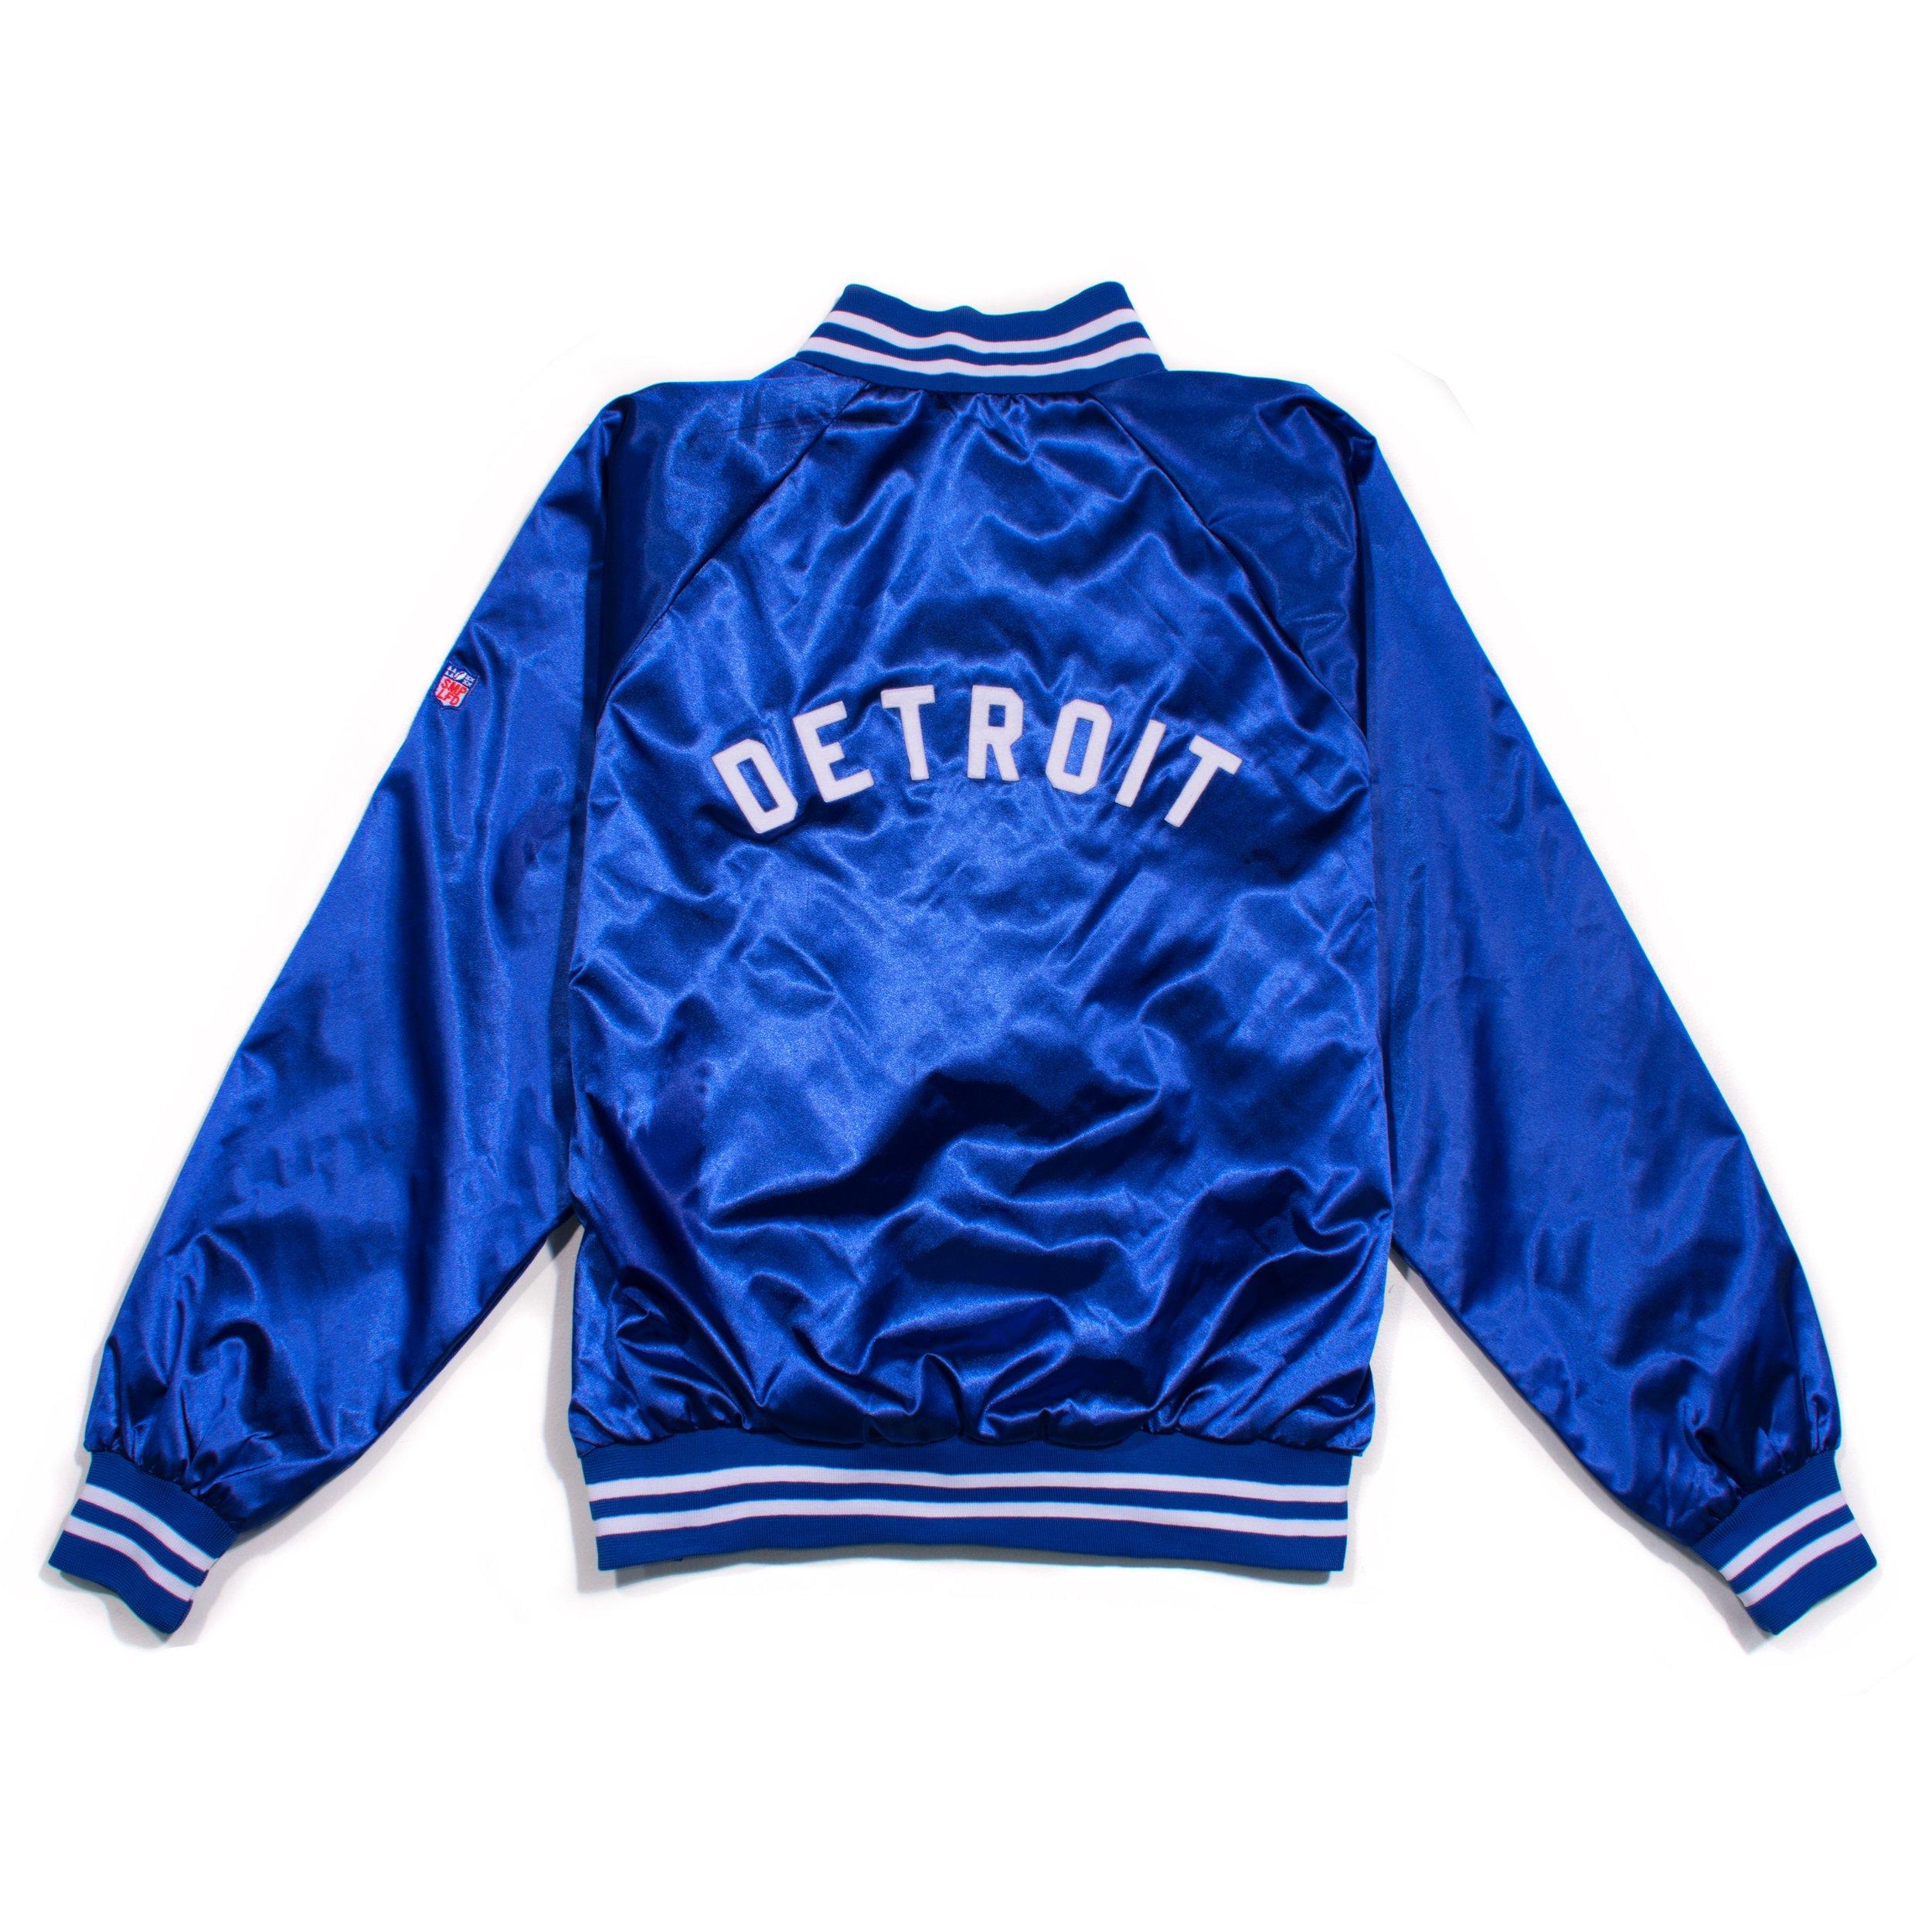 SMPLFD Detroit Football Satin Jacket